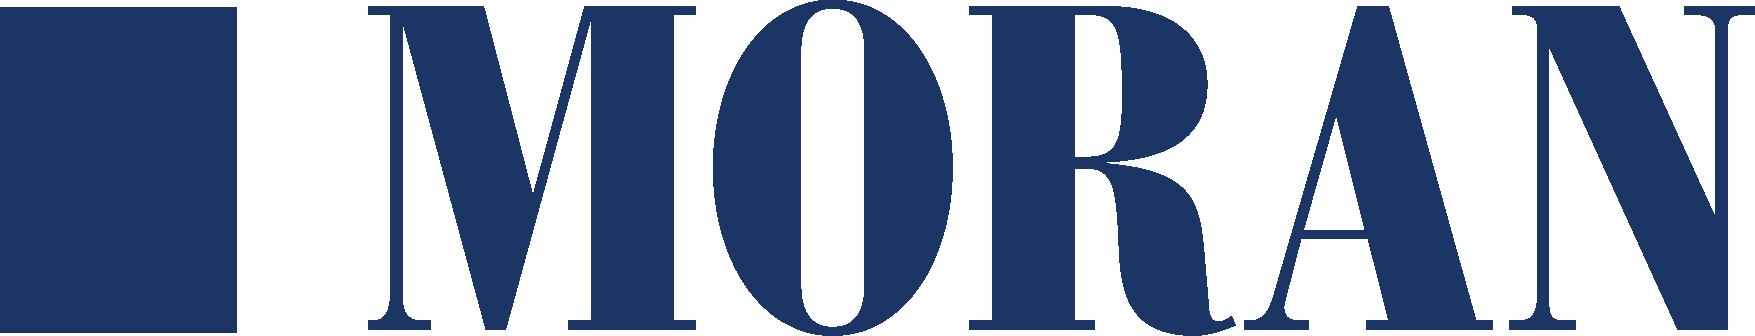 Moran-Group-Logo-Blue.png